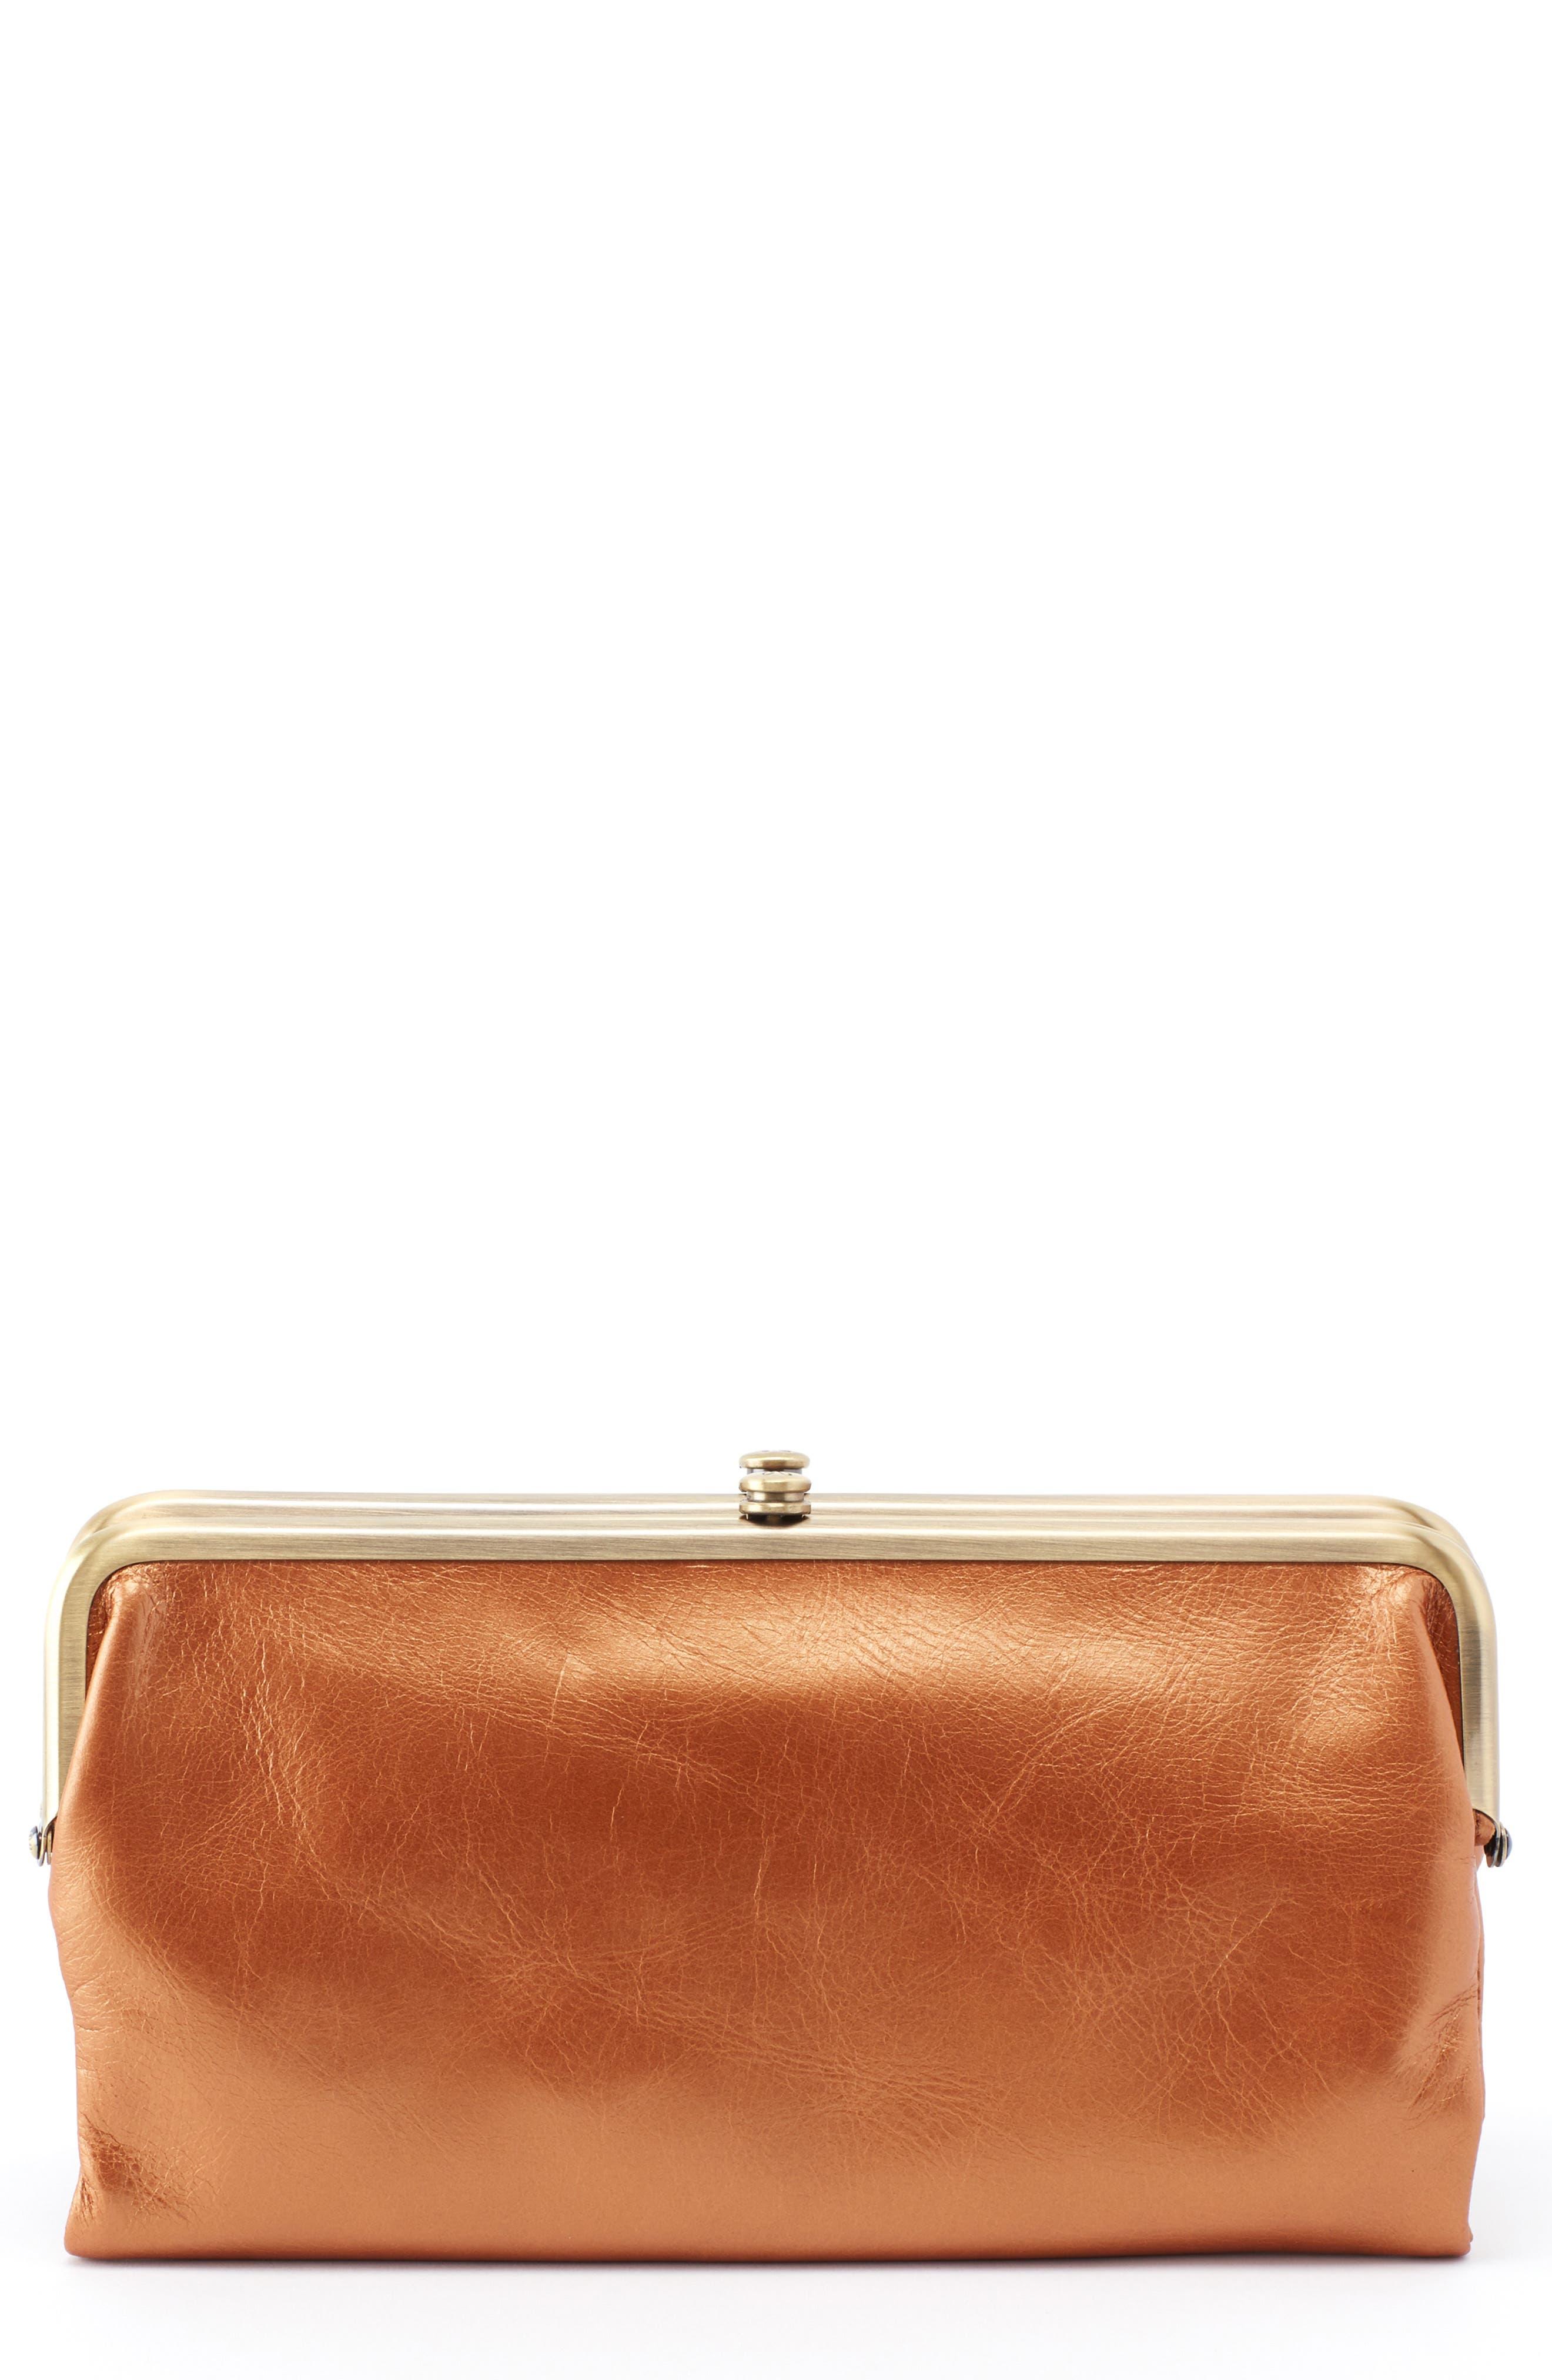 ebcbce3c6d4 Clutches Handbags   Wallets for Women